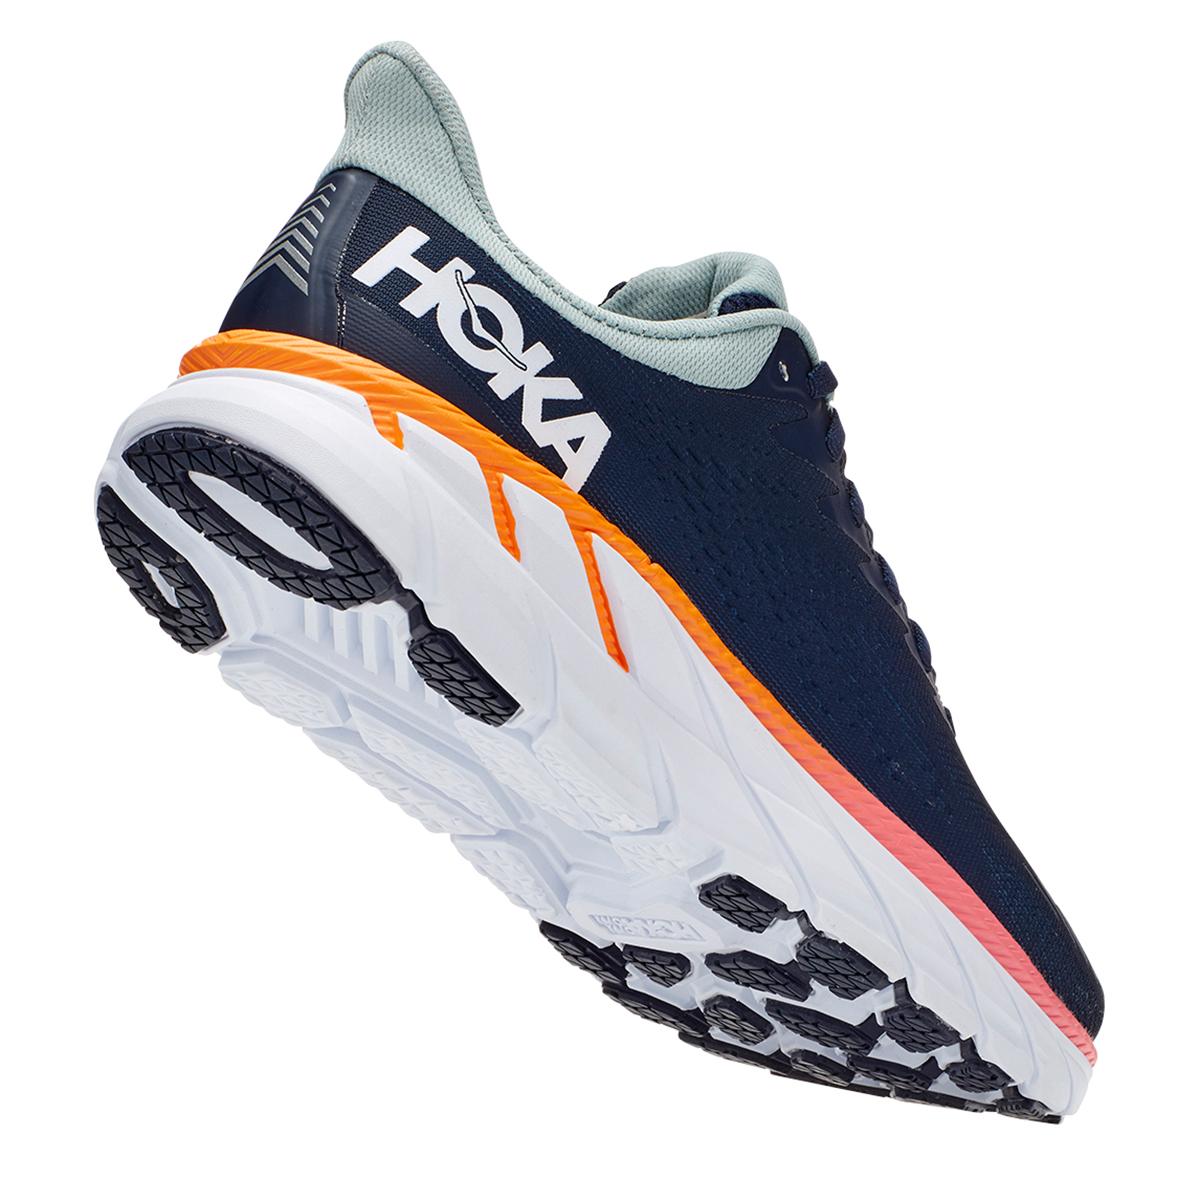 Women's Hoka One One Clifton 7 Running Shoe - Color: Black Iris/Blue Haze - Size: 6 - Width: Regular, Black Iris/Blue Haze, large, image 5